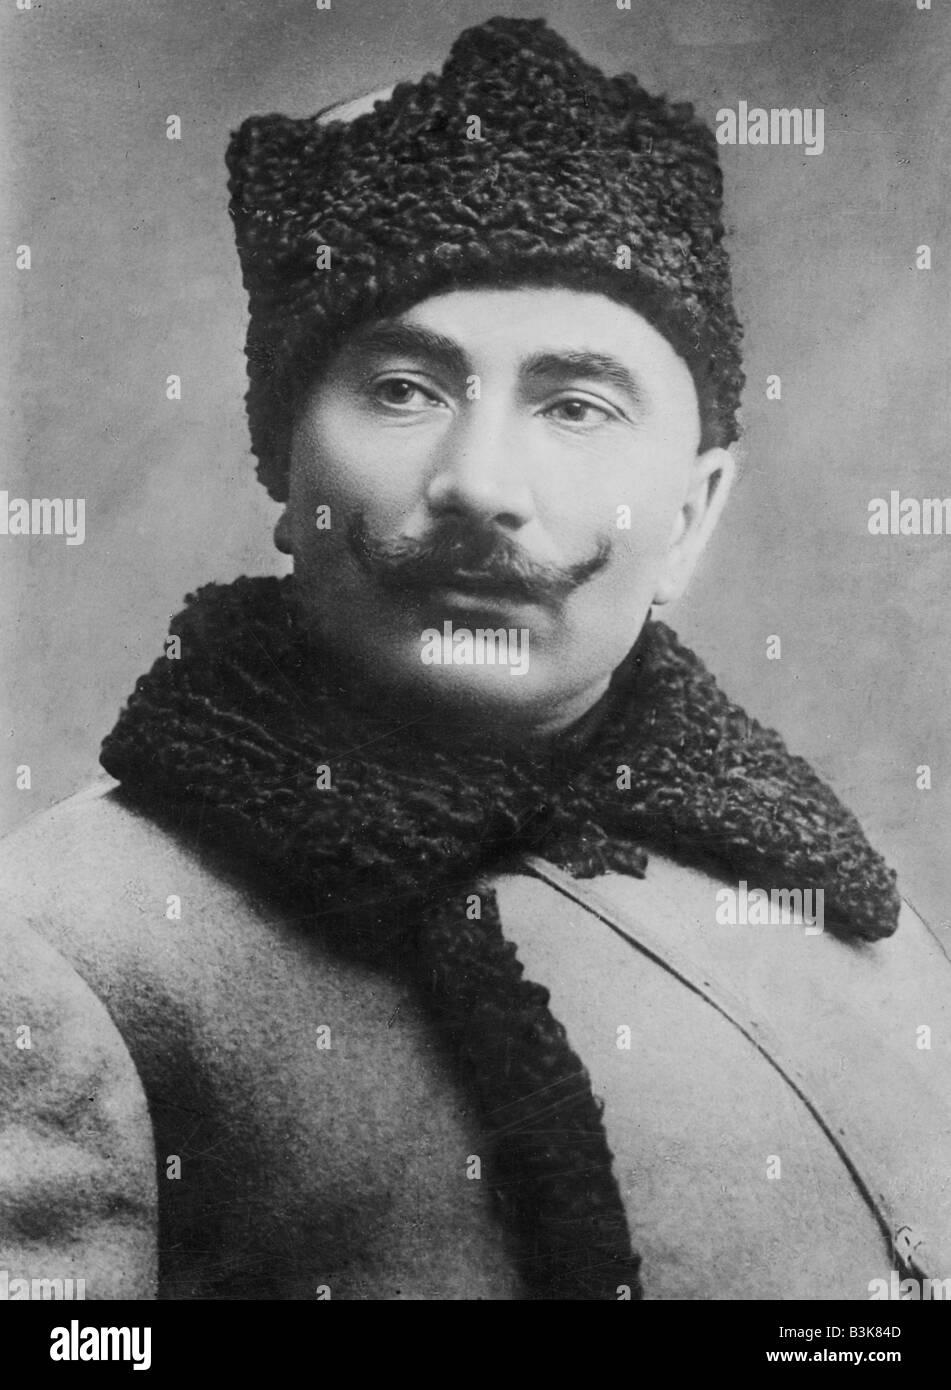 SEMYON MIKHAILOVICH BUDENNY  Soviet military commander 1883 to 1973 here in 1927 Stock Photo